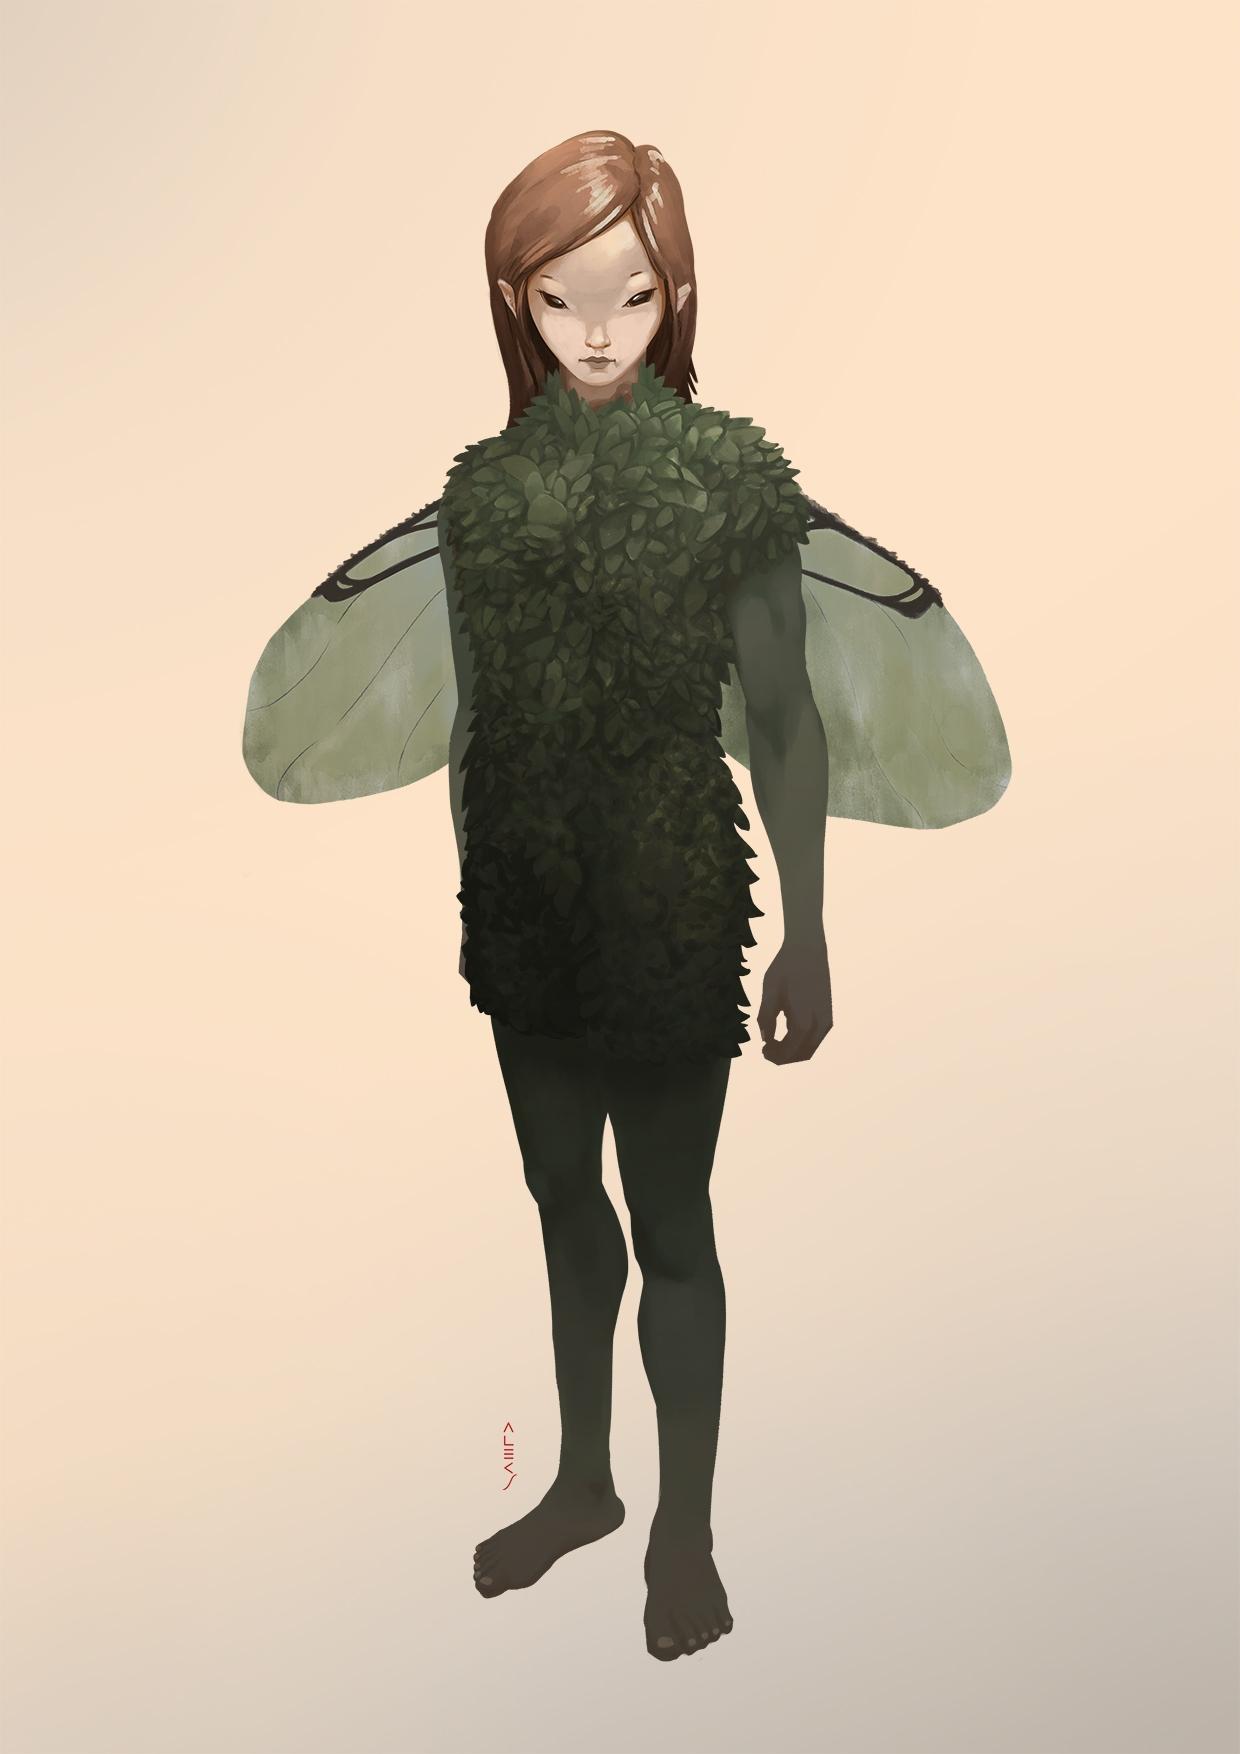 Elf - elf, characterdesign - alecs-1191 | ello